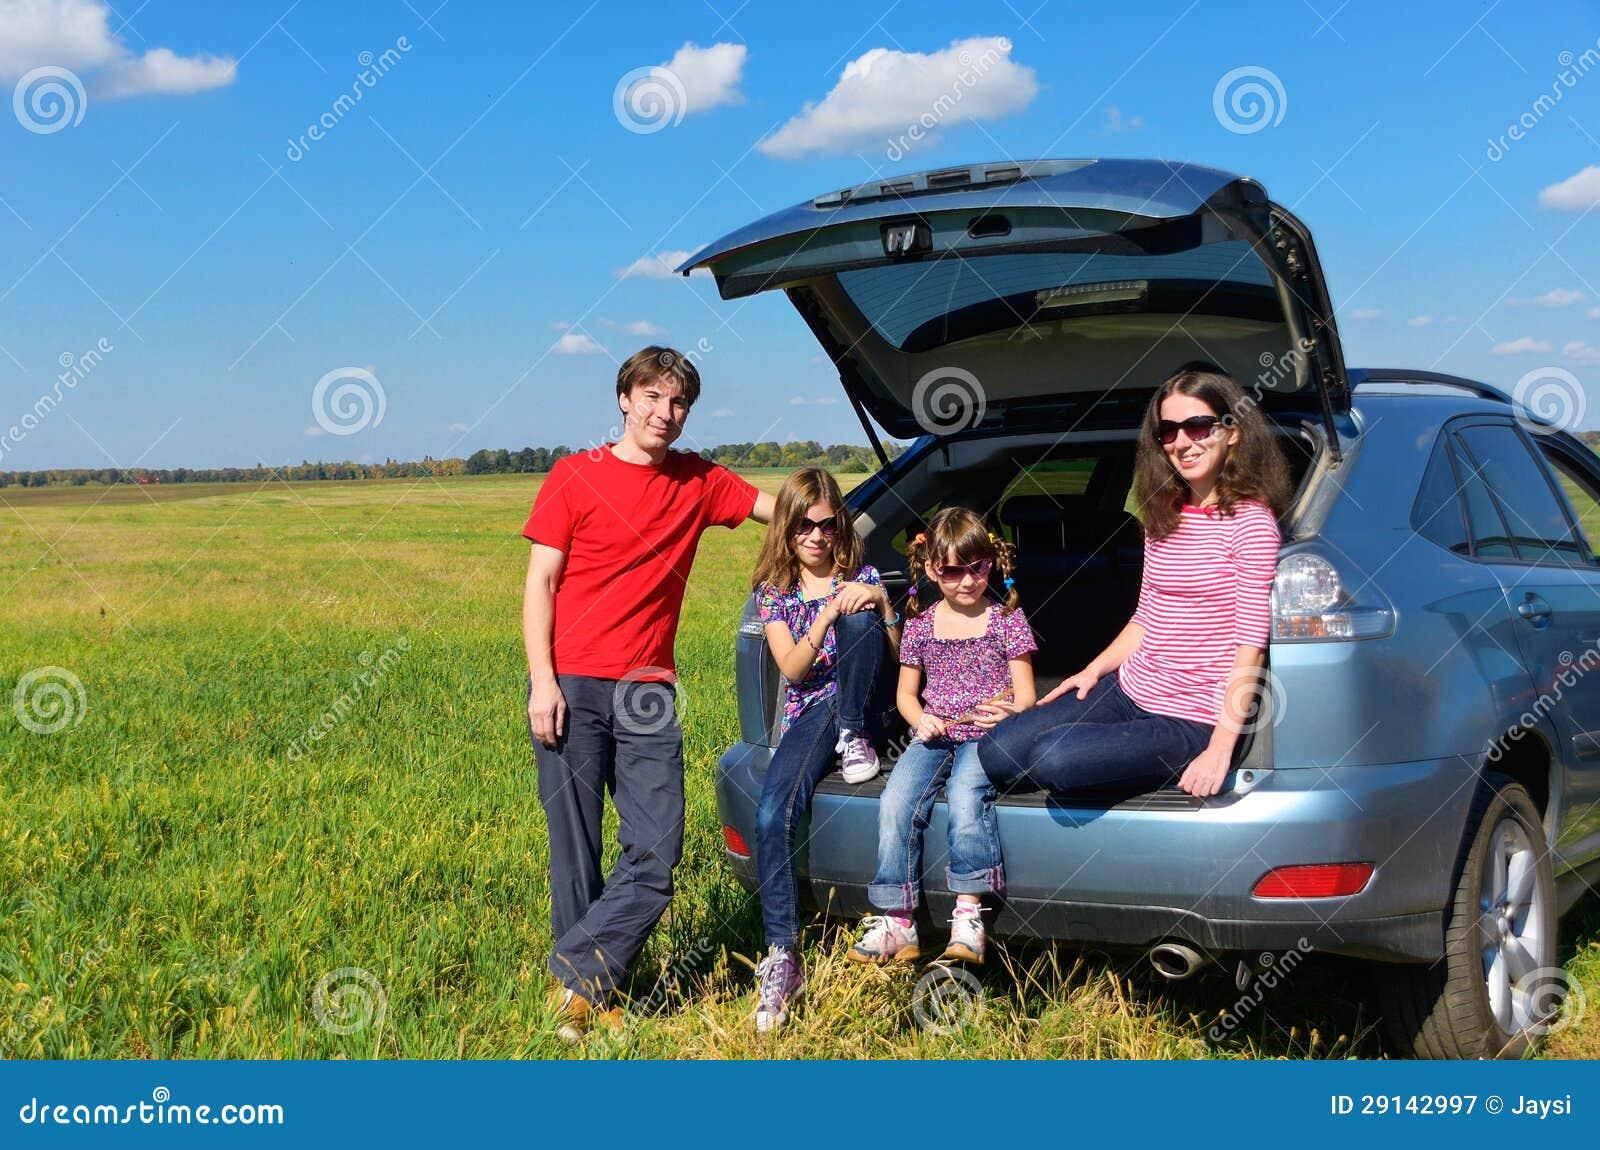 Car insurance 7 days free 2014